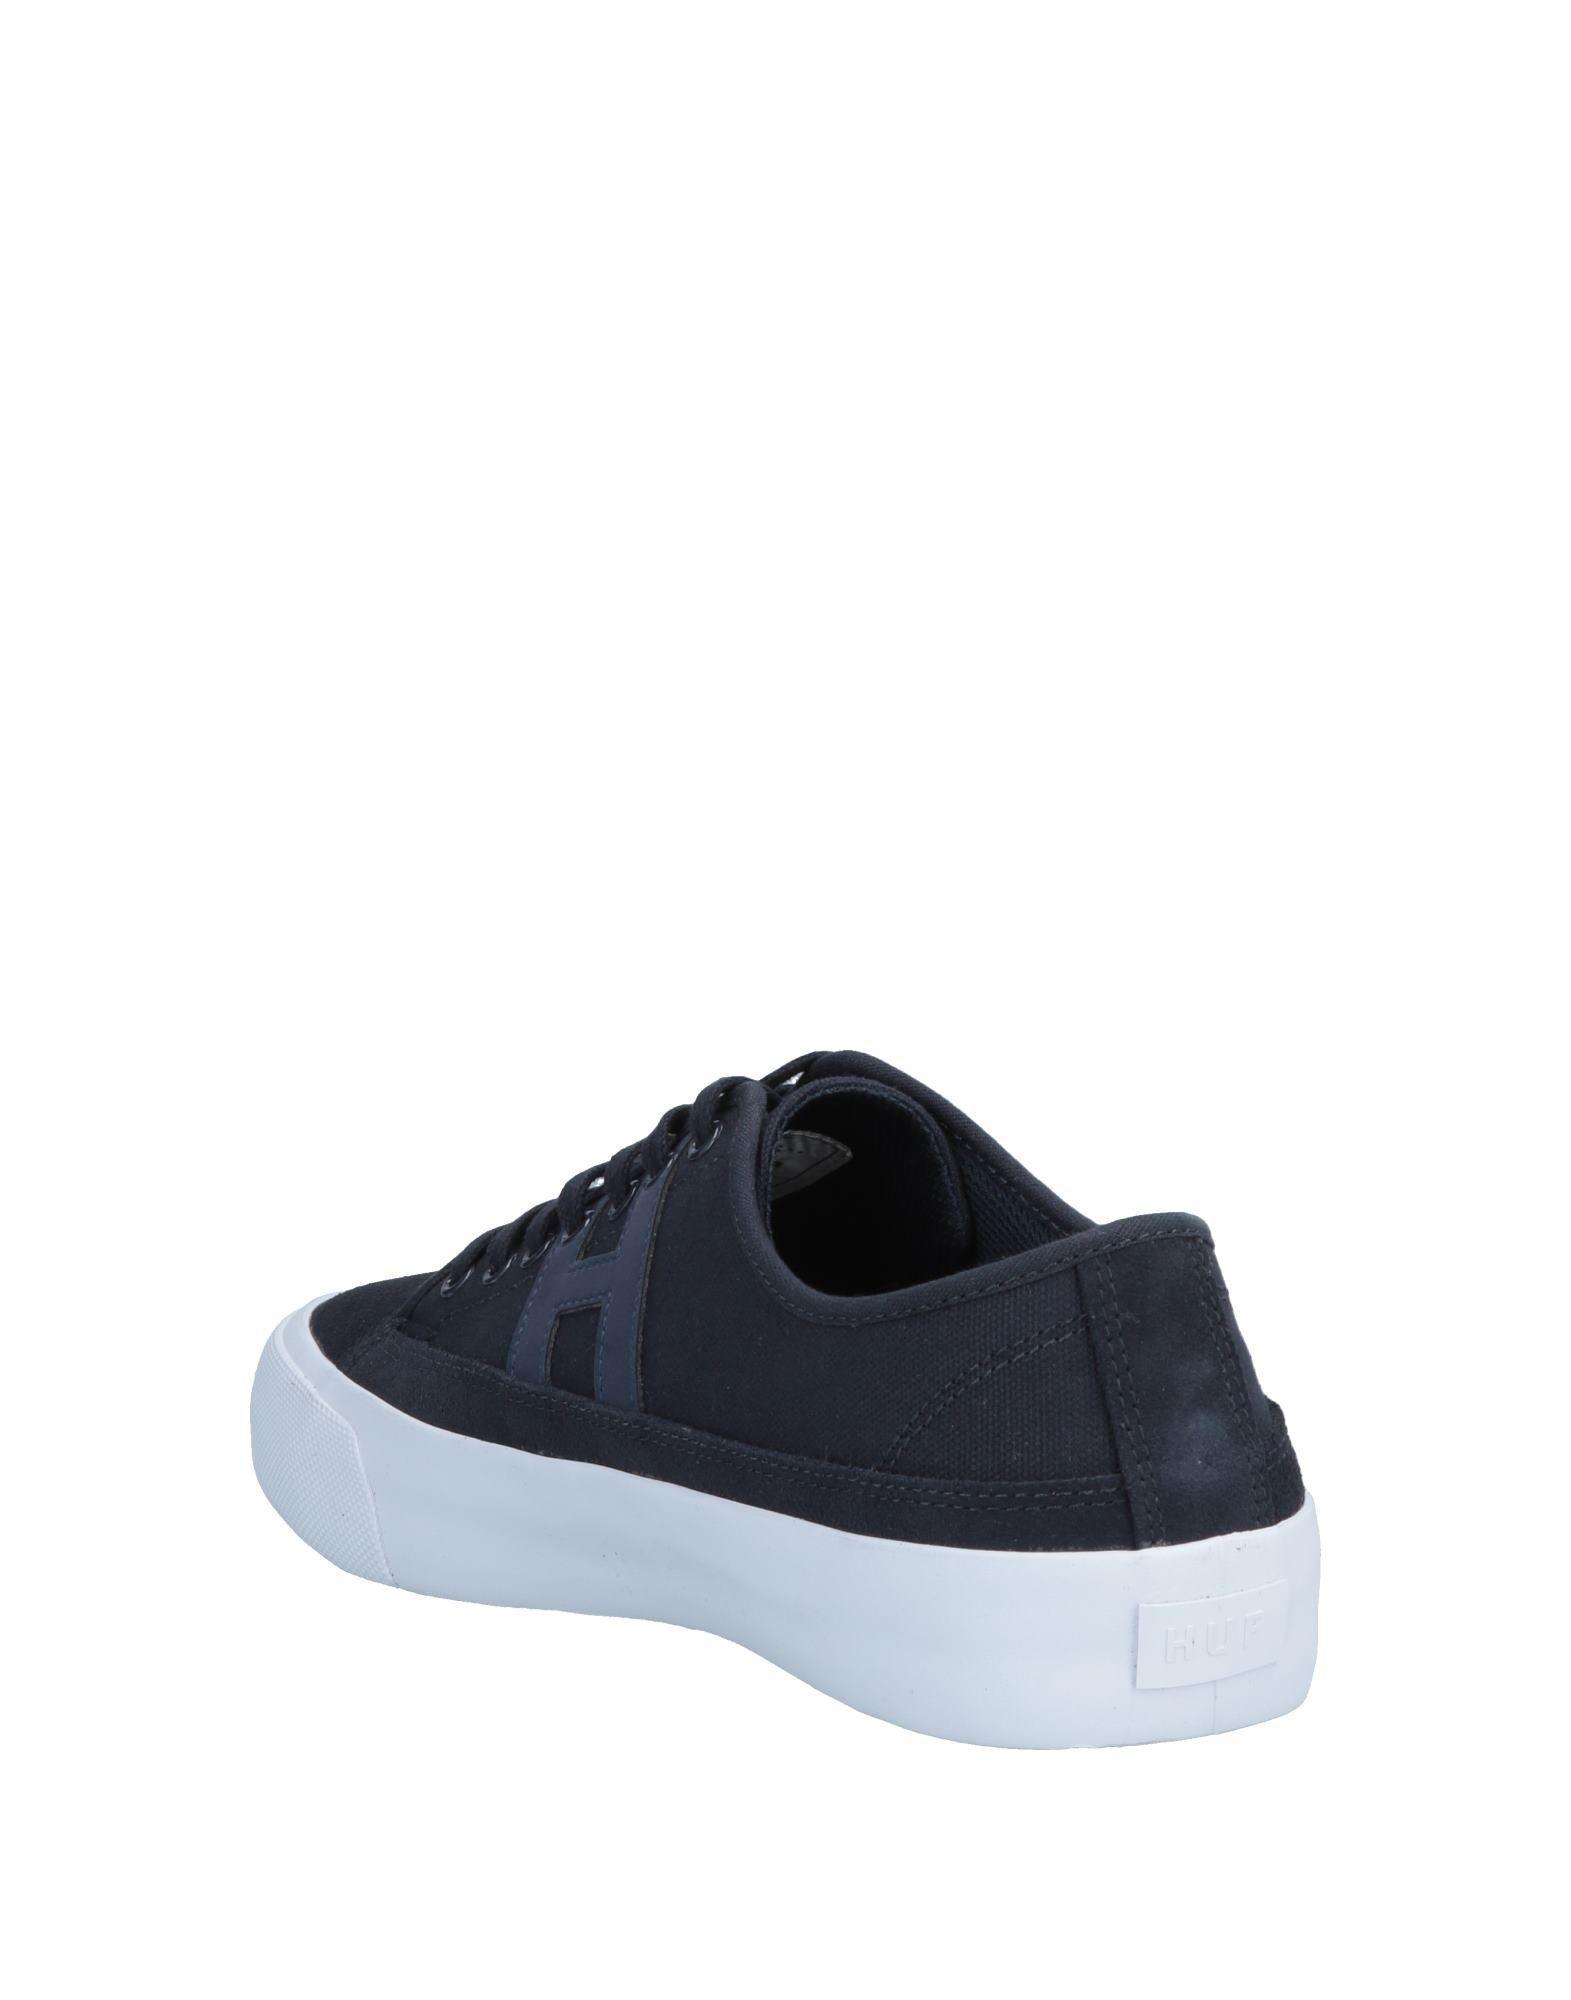 363b6c36d2693 Lyst - Huf Low-tops & Sneakers in Blue for Men